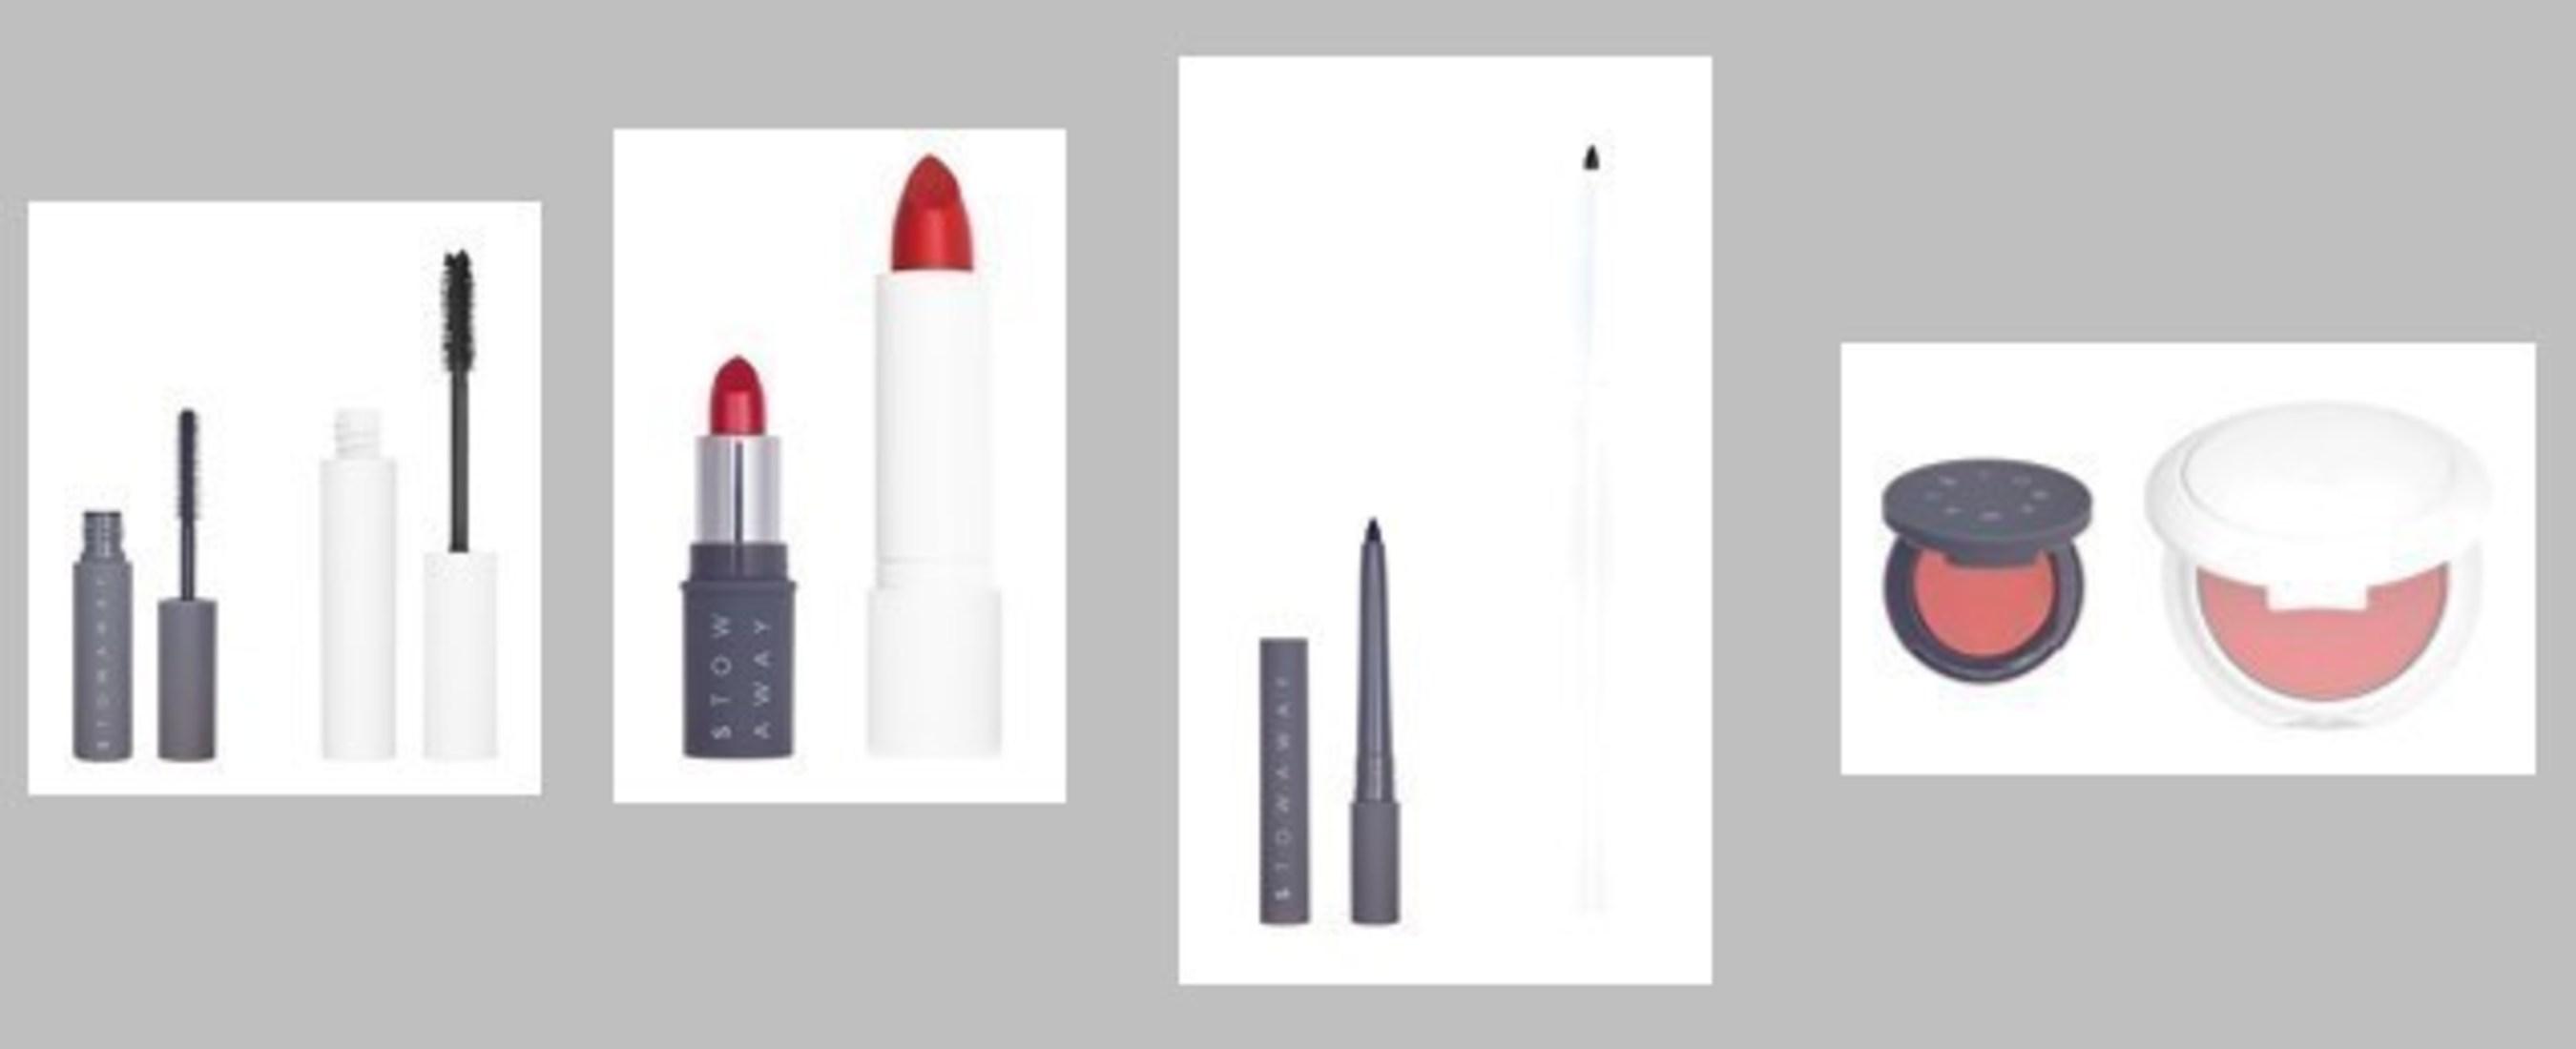 Women's Beauty Habits Exposed by NEW Stowaway Cosmetics Survey